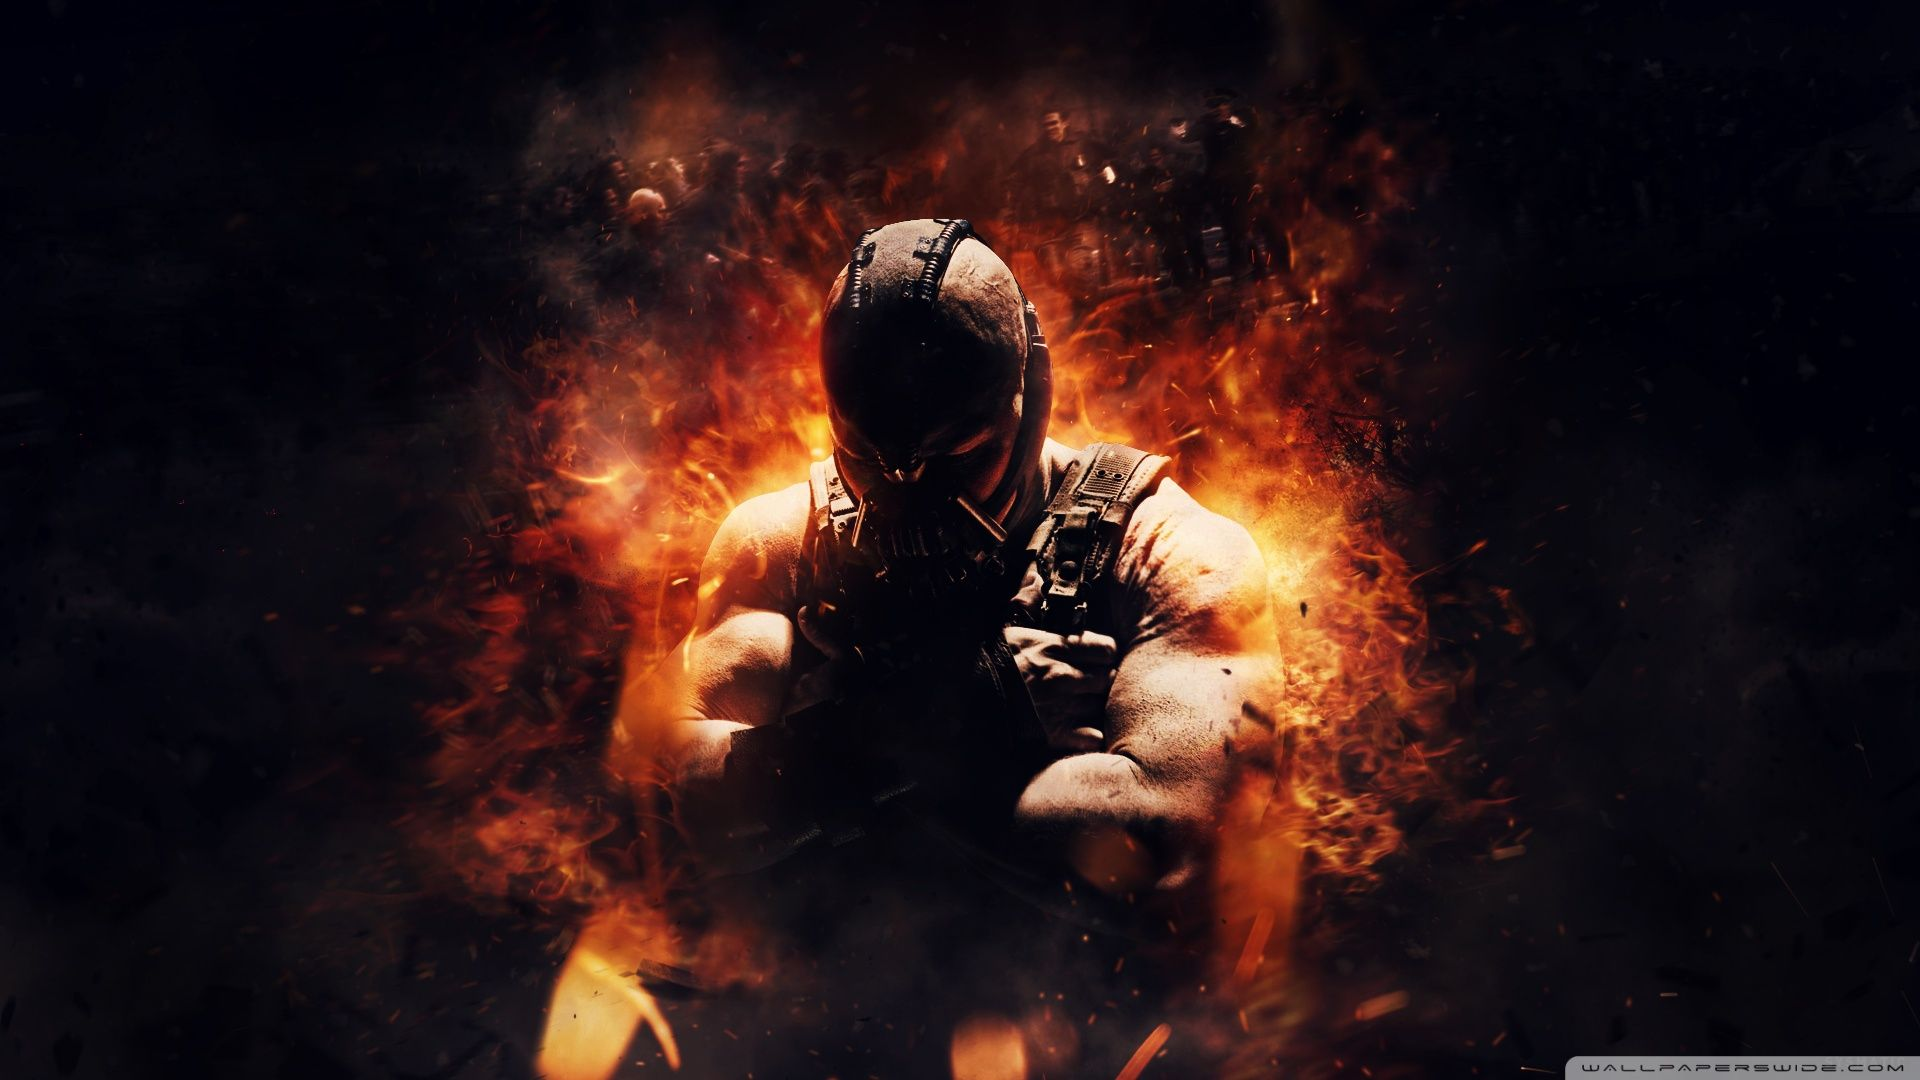 Dark Knight Rises Bane Wallpapers Top Free Dark Knight Rises Bane Backgrounds Wallpaperaccess